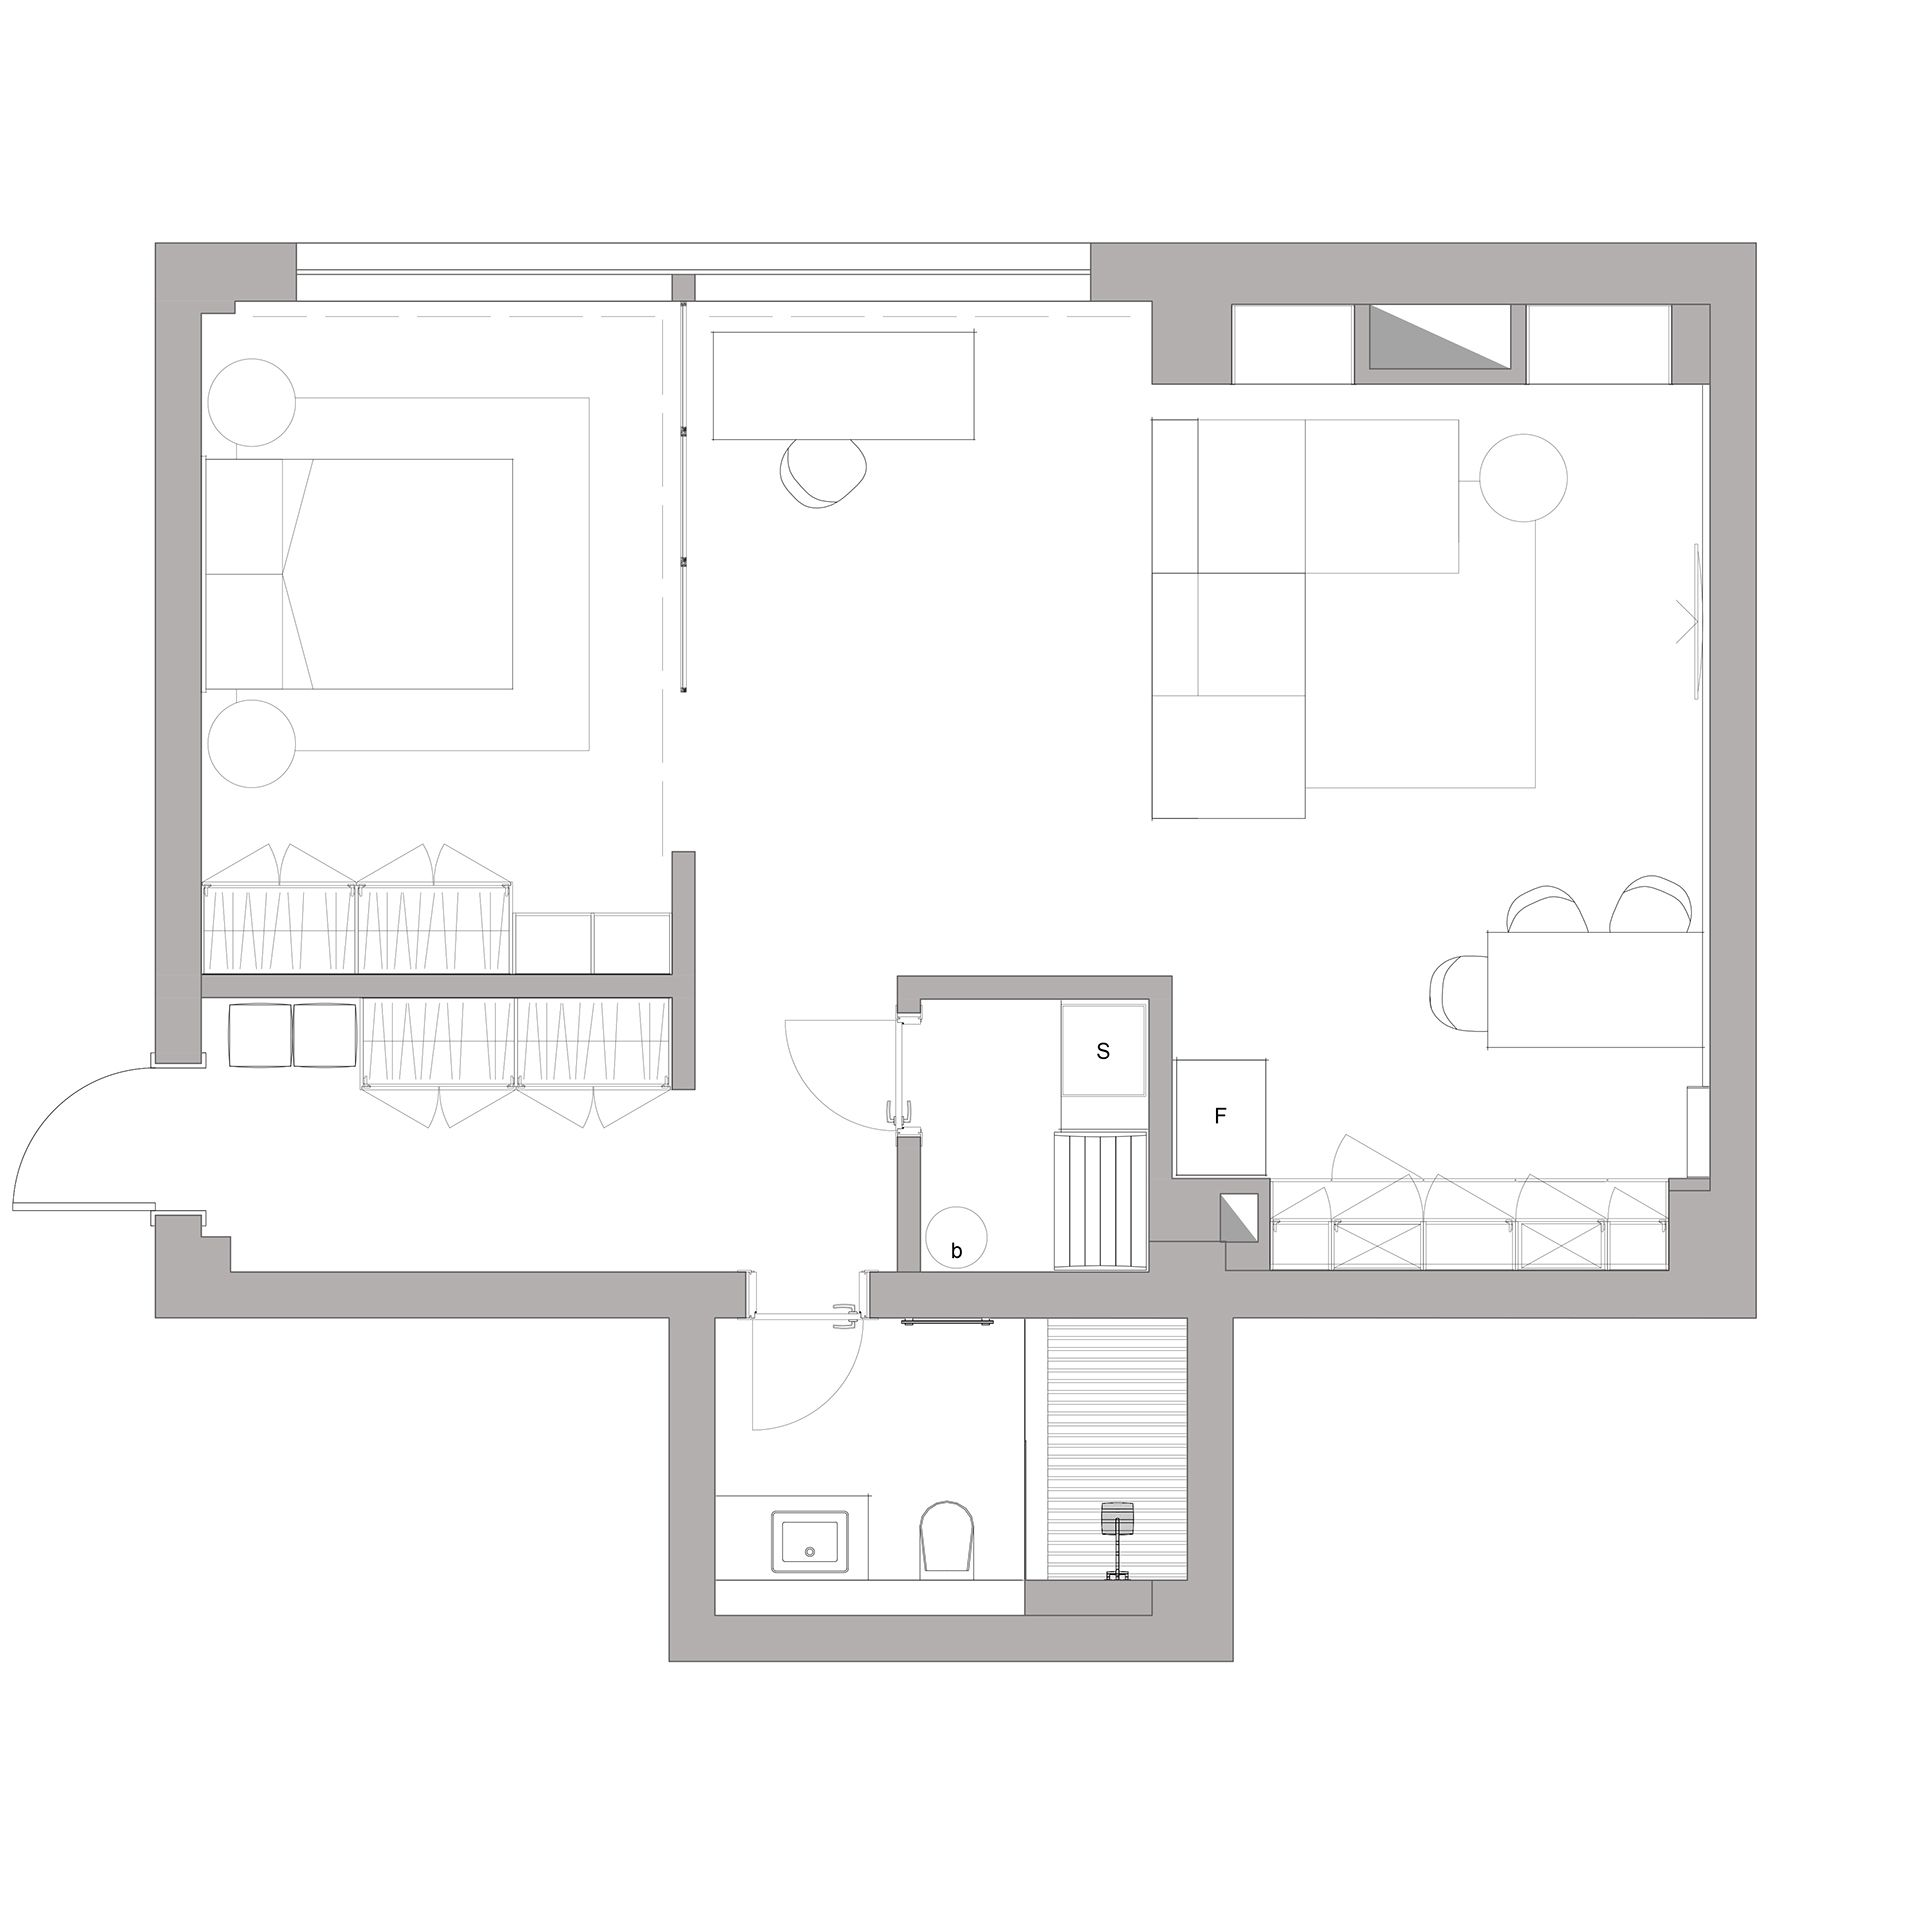 3 Modern Home Interiors Under 70 Square Metres (750 Square